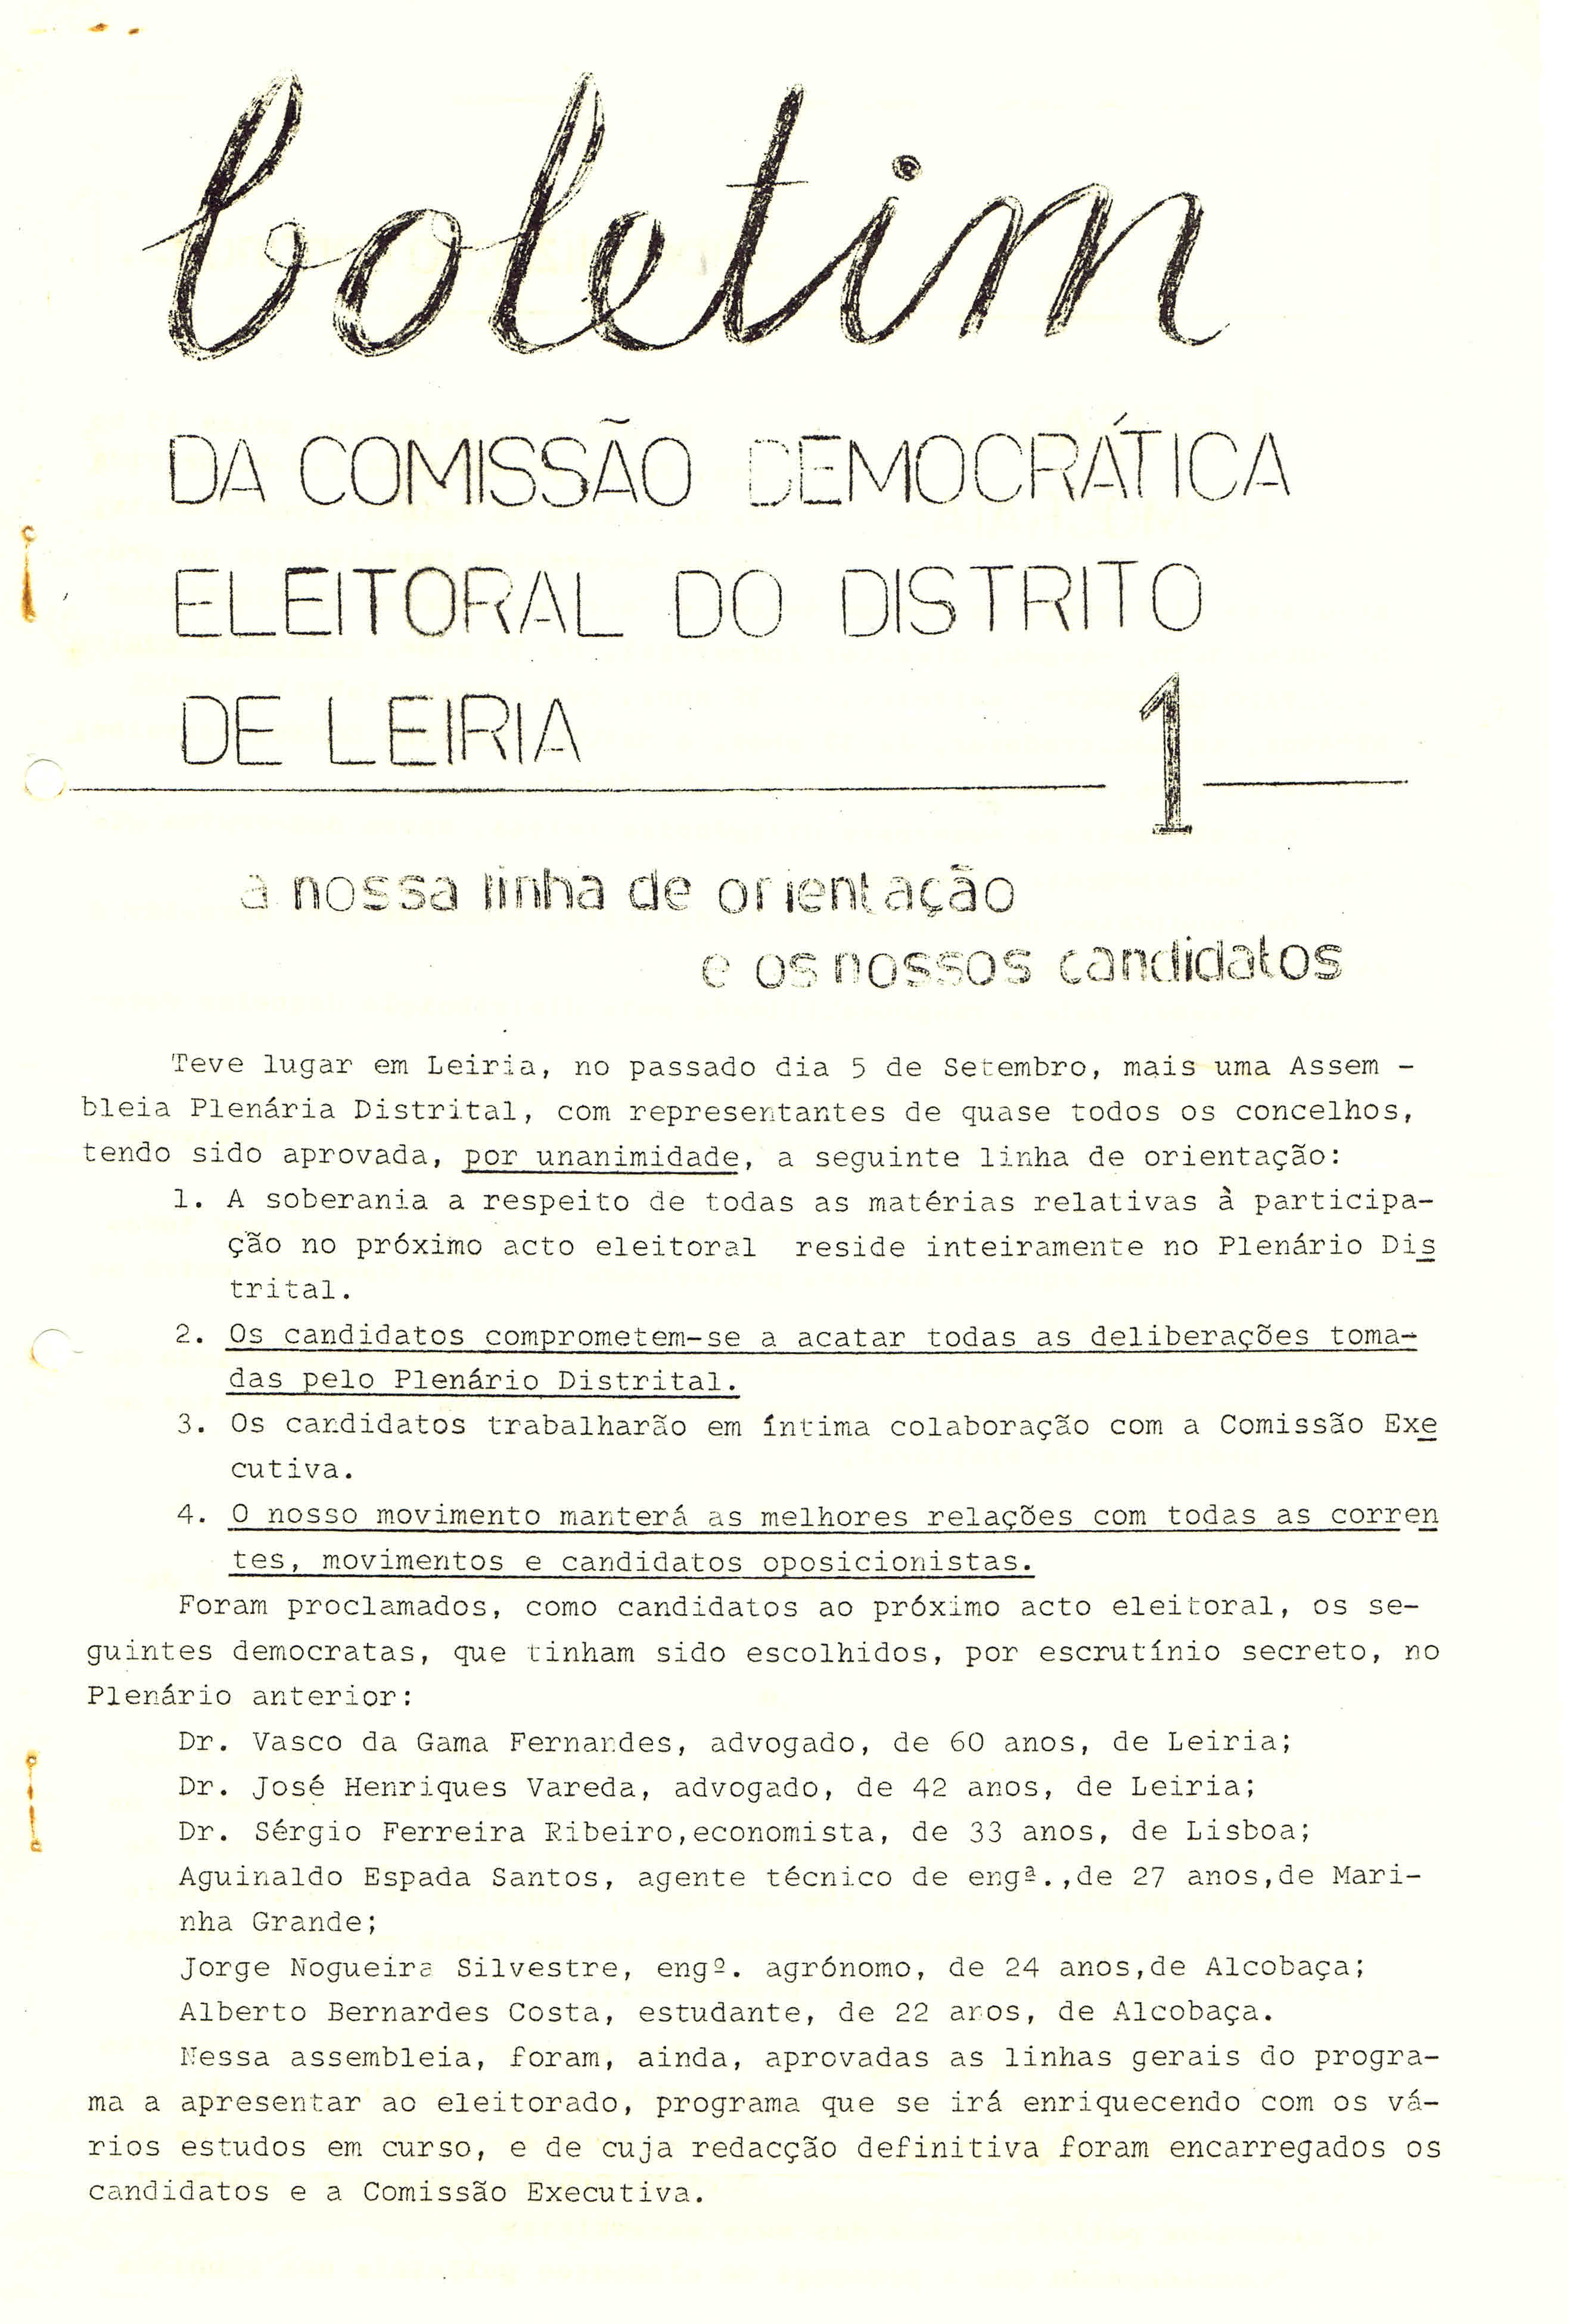 Copy of Document (9)